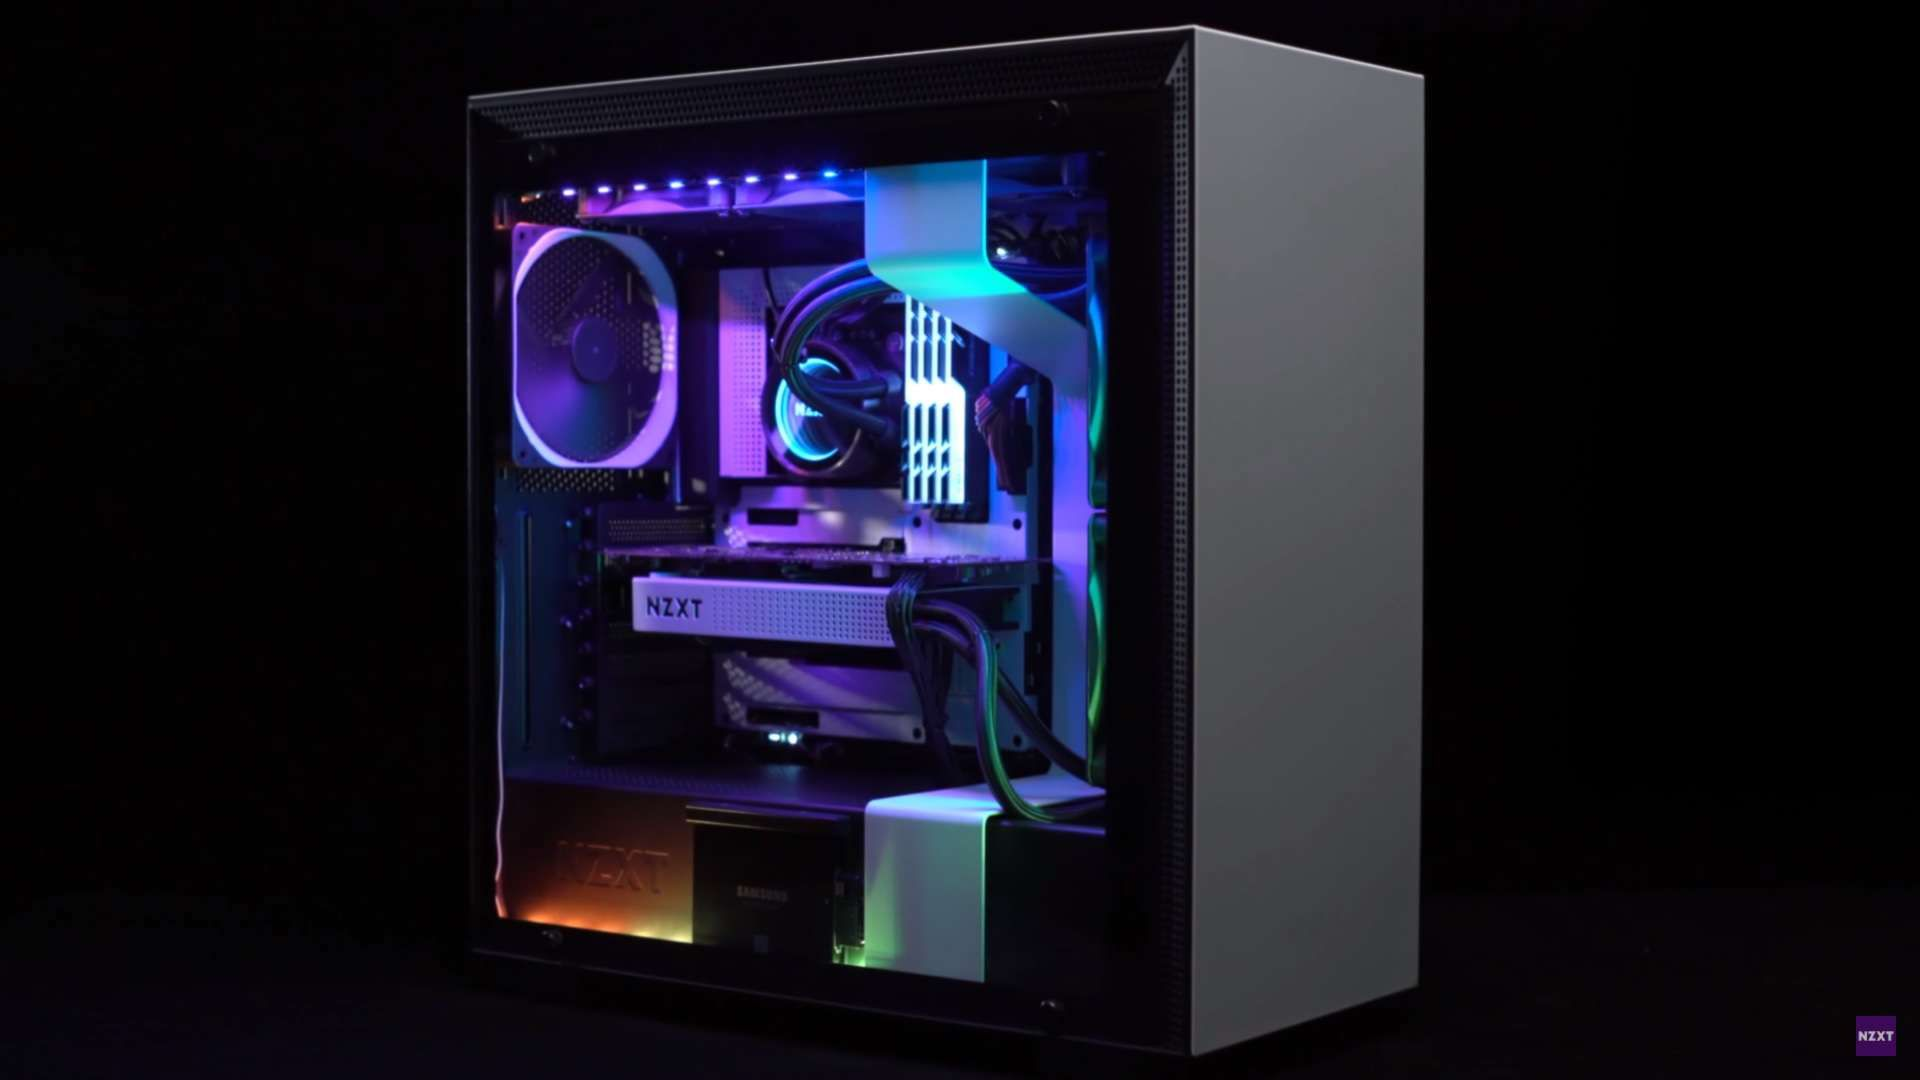 Dg Athena Sword Gaming Pc I9 9900k 64gb 2080ti 11gb Graphics Computer Hardware Computer Tower Gaming Desktop